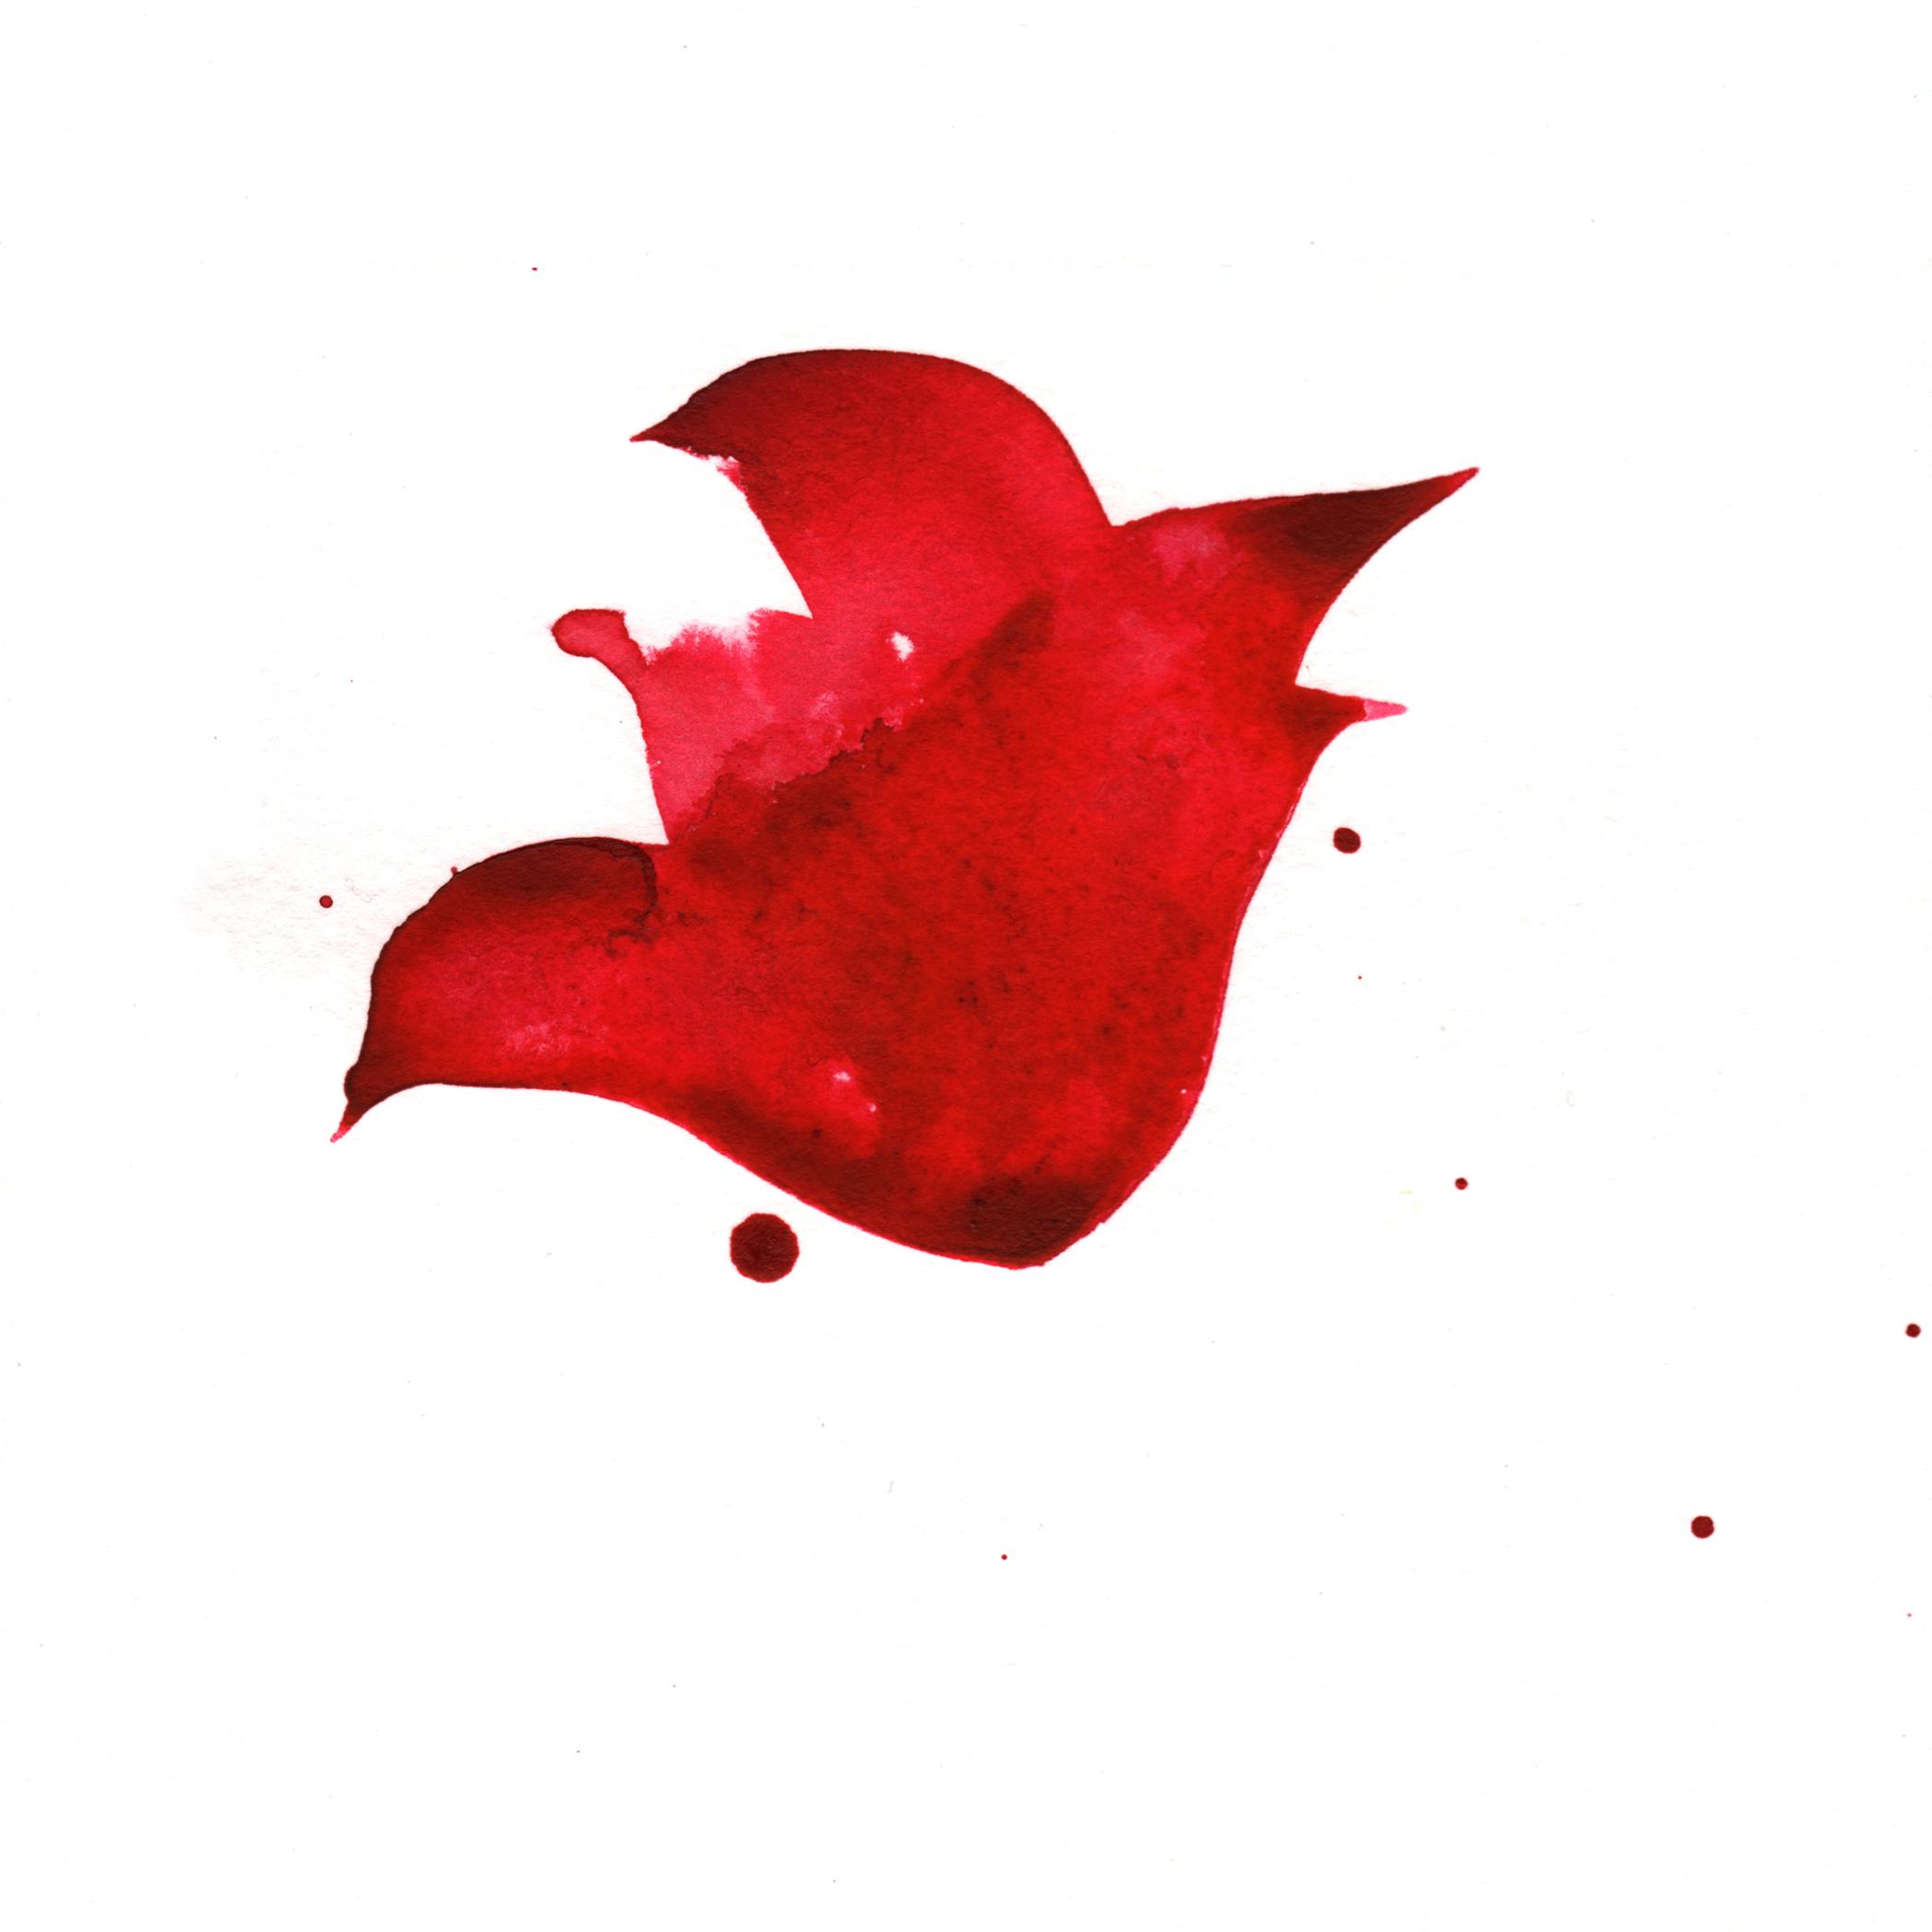 8.Tulip.2.16.14.jpg